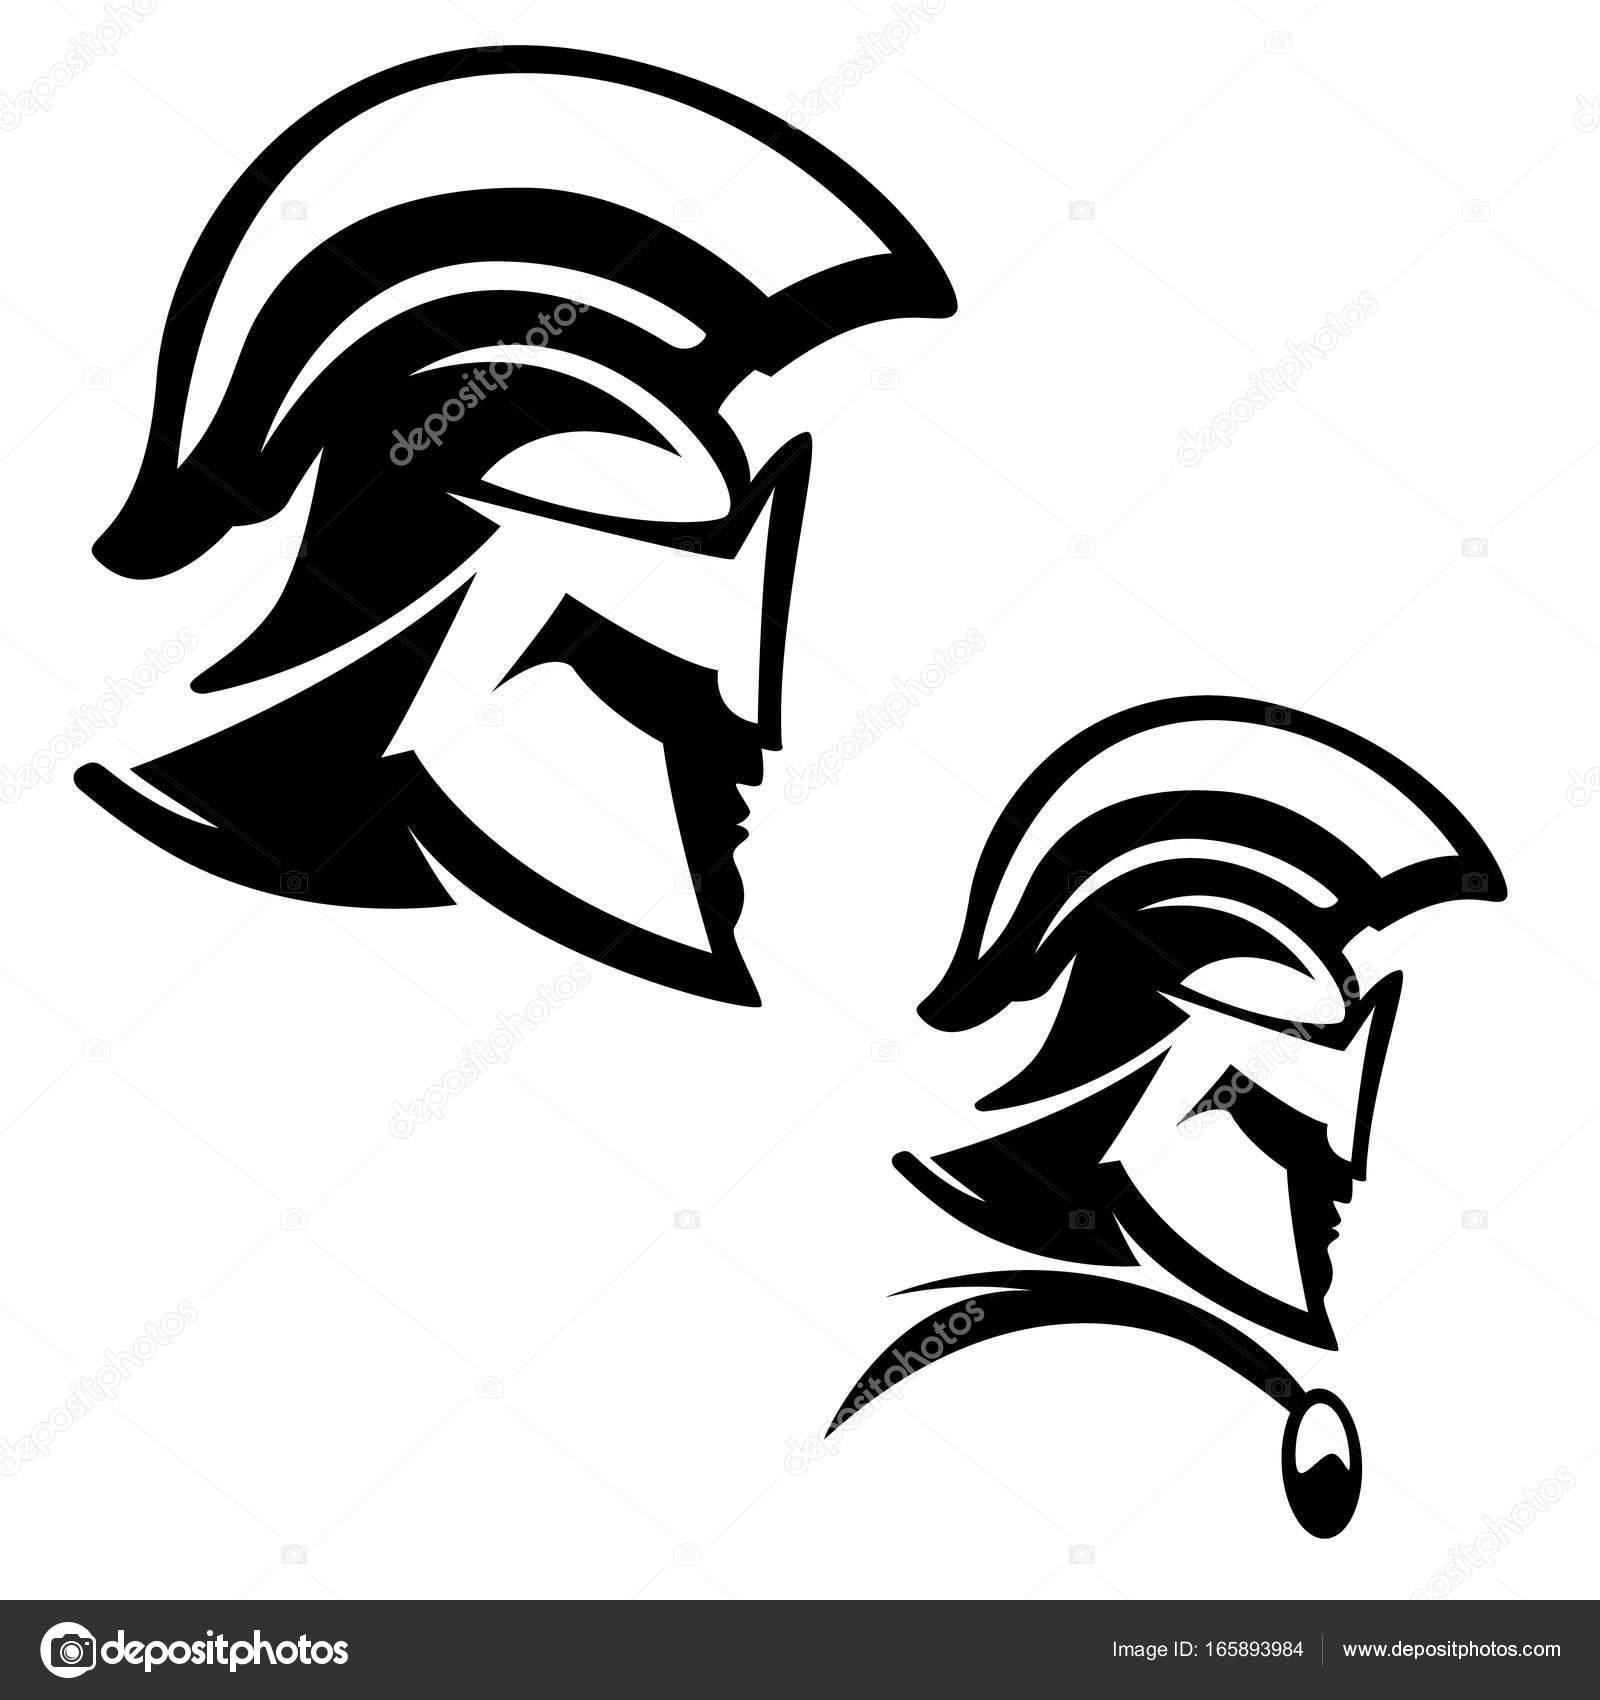 1600x1700 Spartan Warrior Illustration Isolated On White Background. Stock